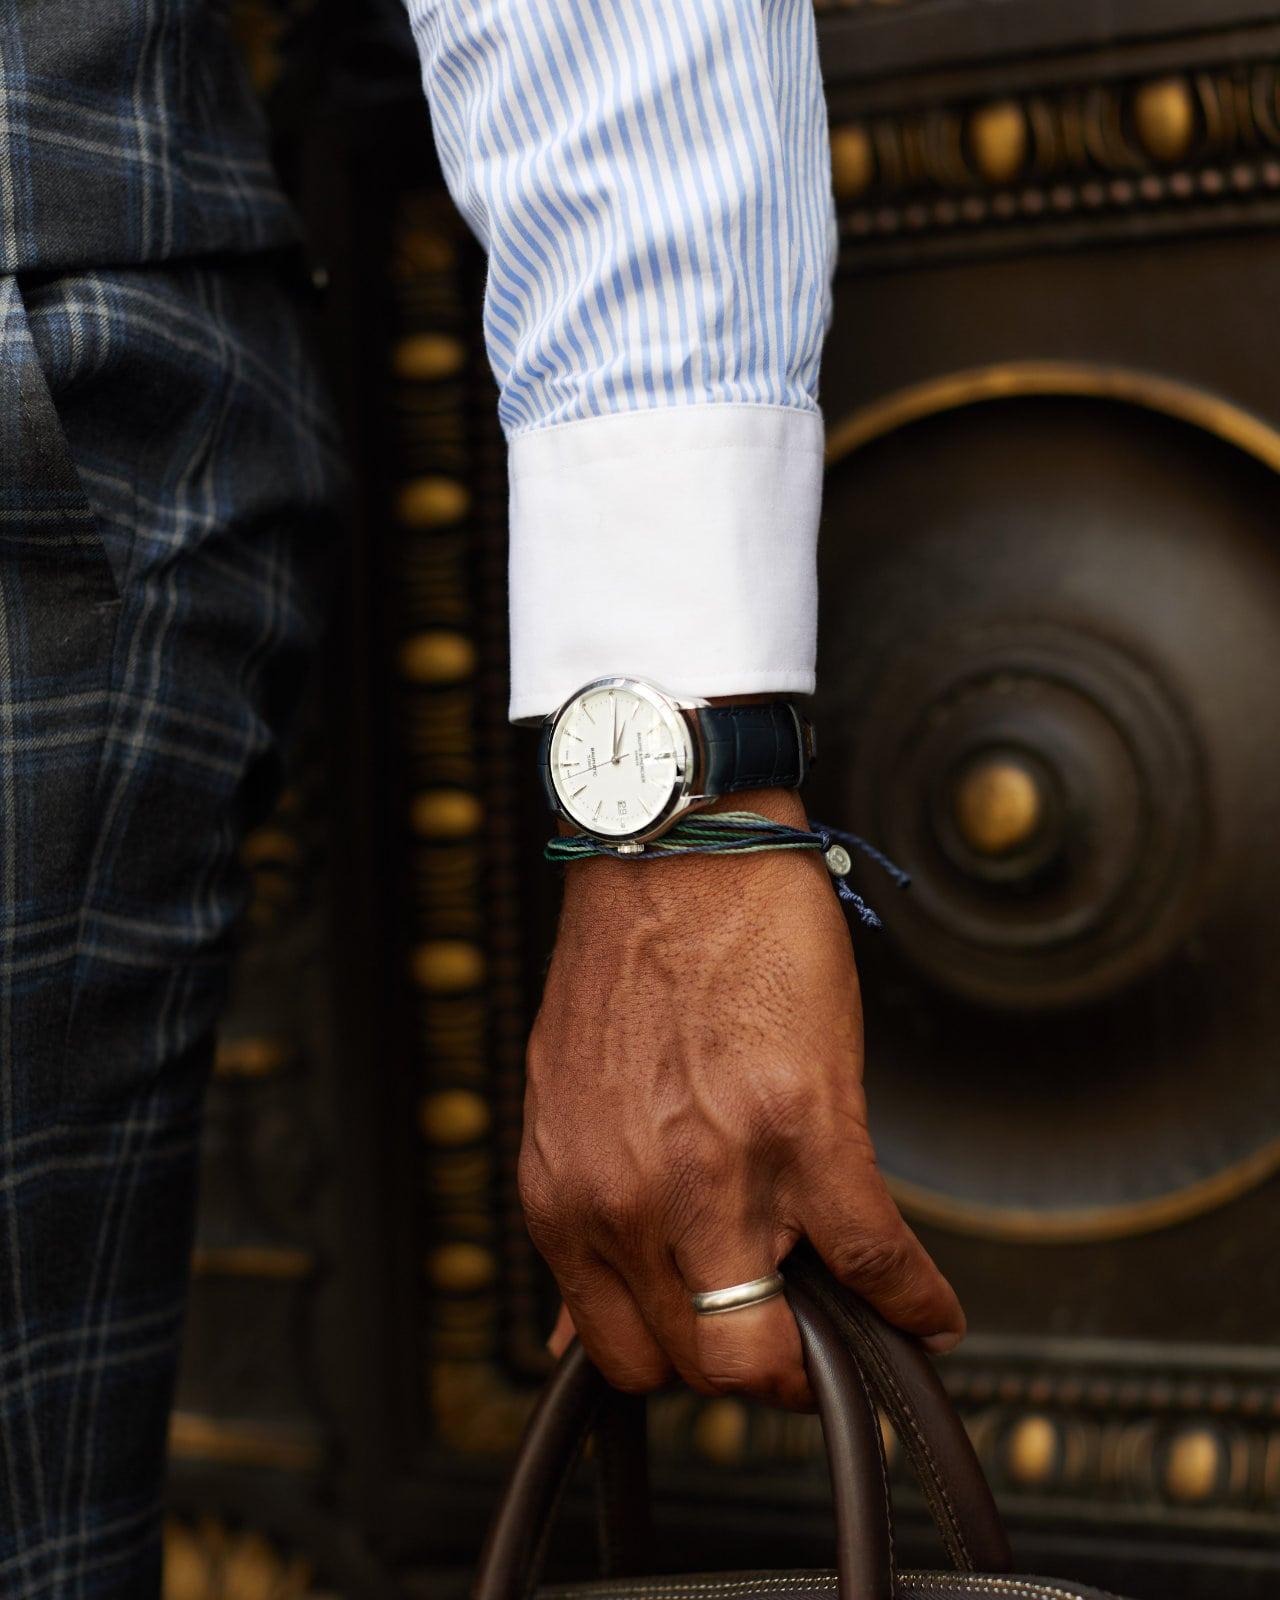 Baume et Mercier Clifton Baumatic Watch via Govberg Jewelers